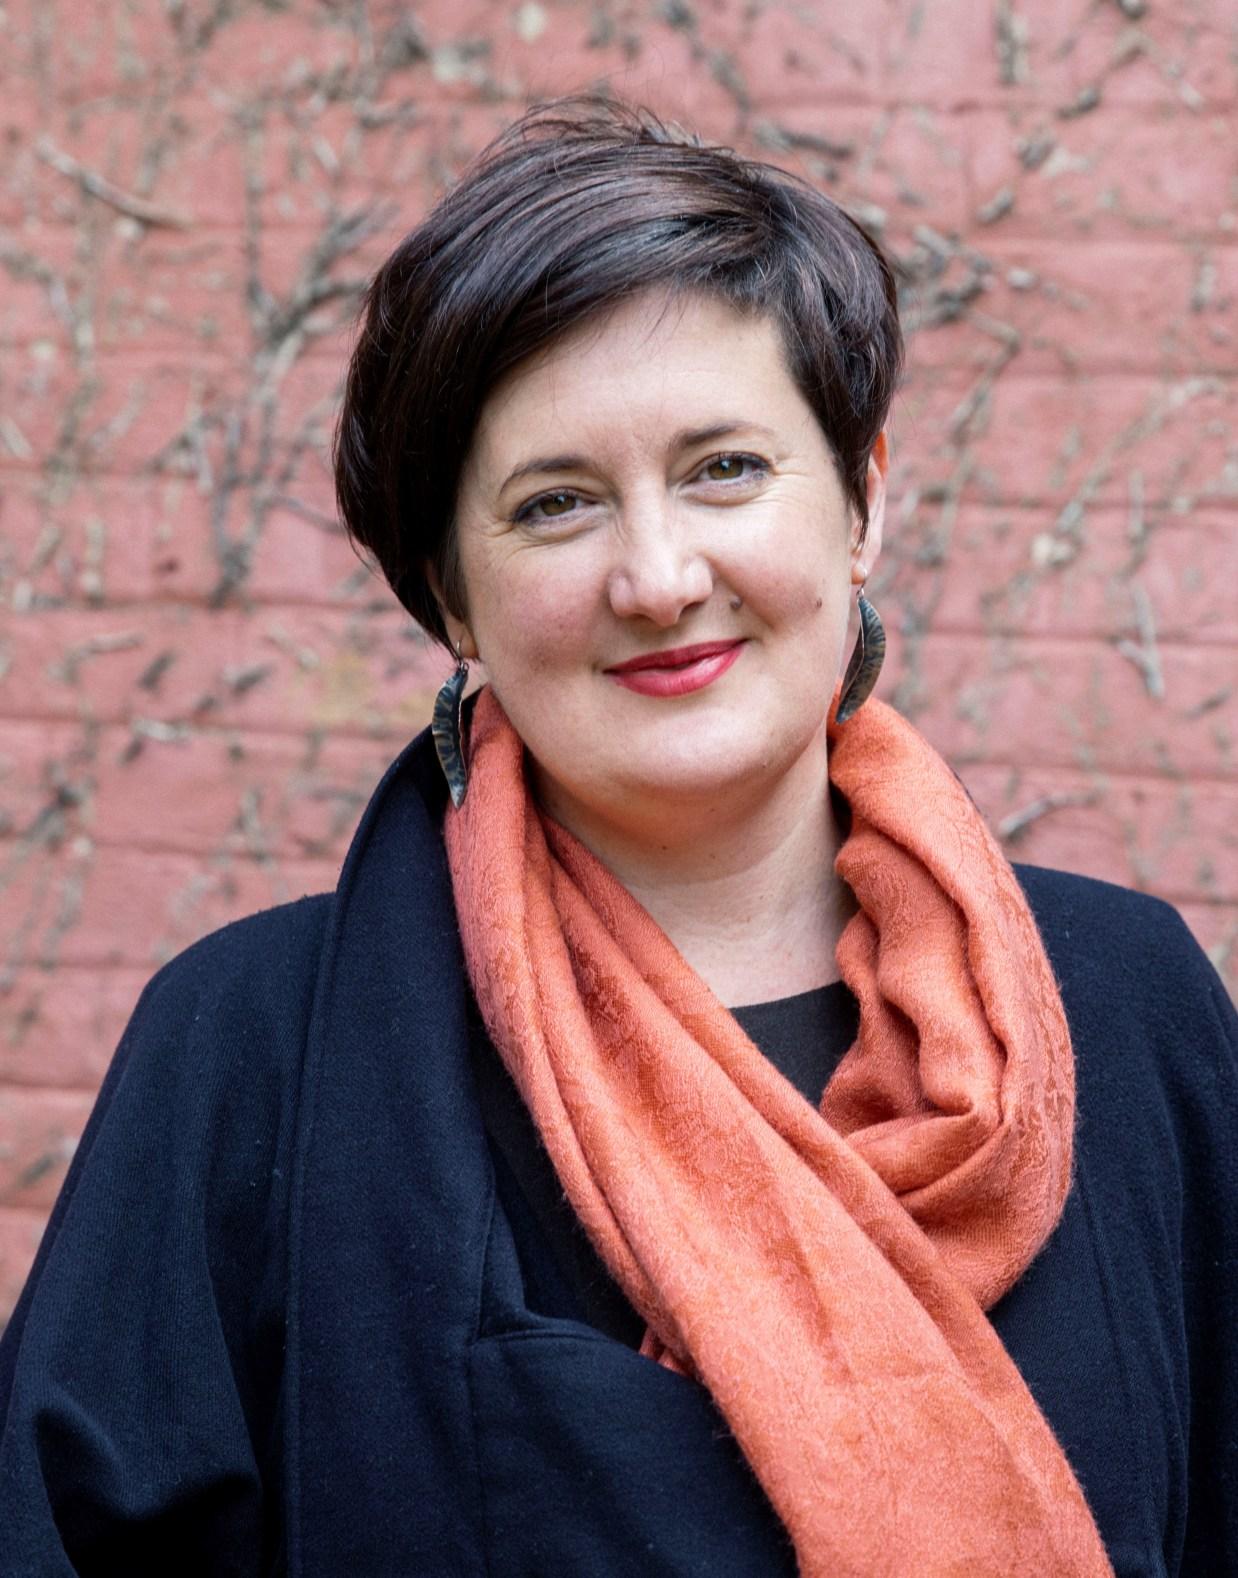 <strong>ANNA FRASER - Soprano, Sydney</strong>